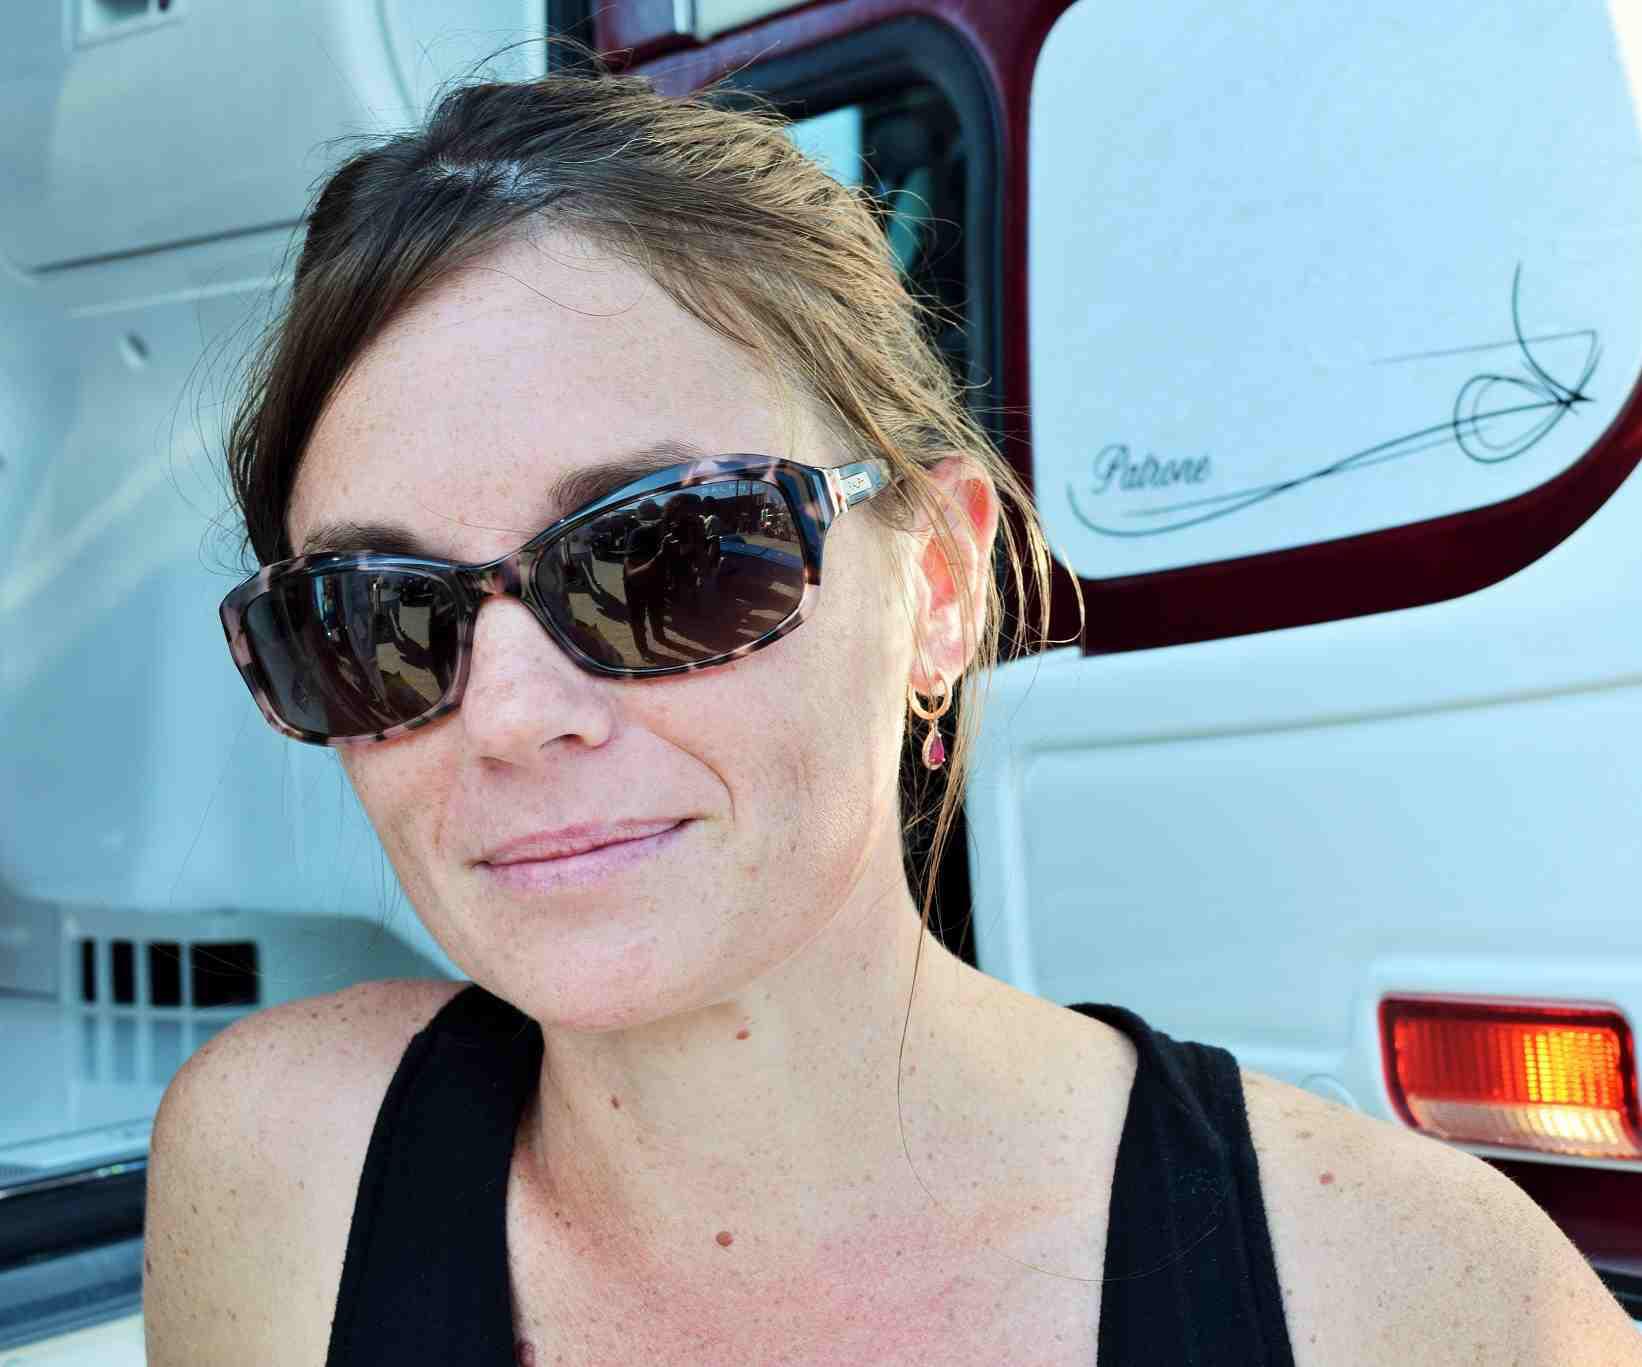 Petro Joplin Mo >> Video: More on the 2017 Peterbilt 389 flattop of Candice Cooley's Patrone Livestock fleet